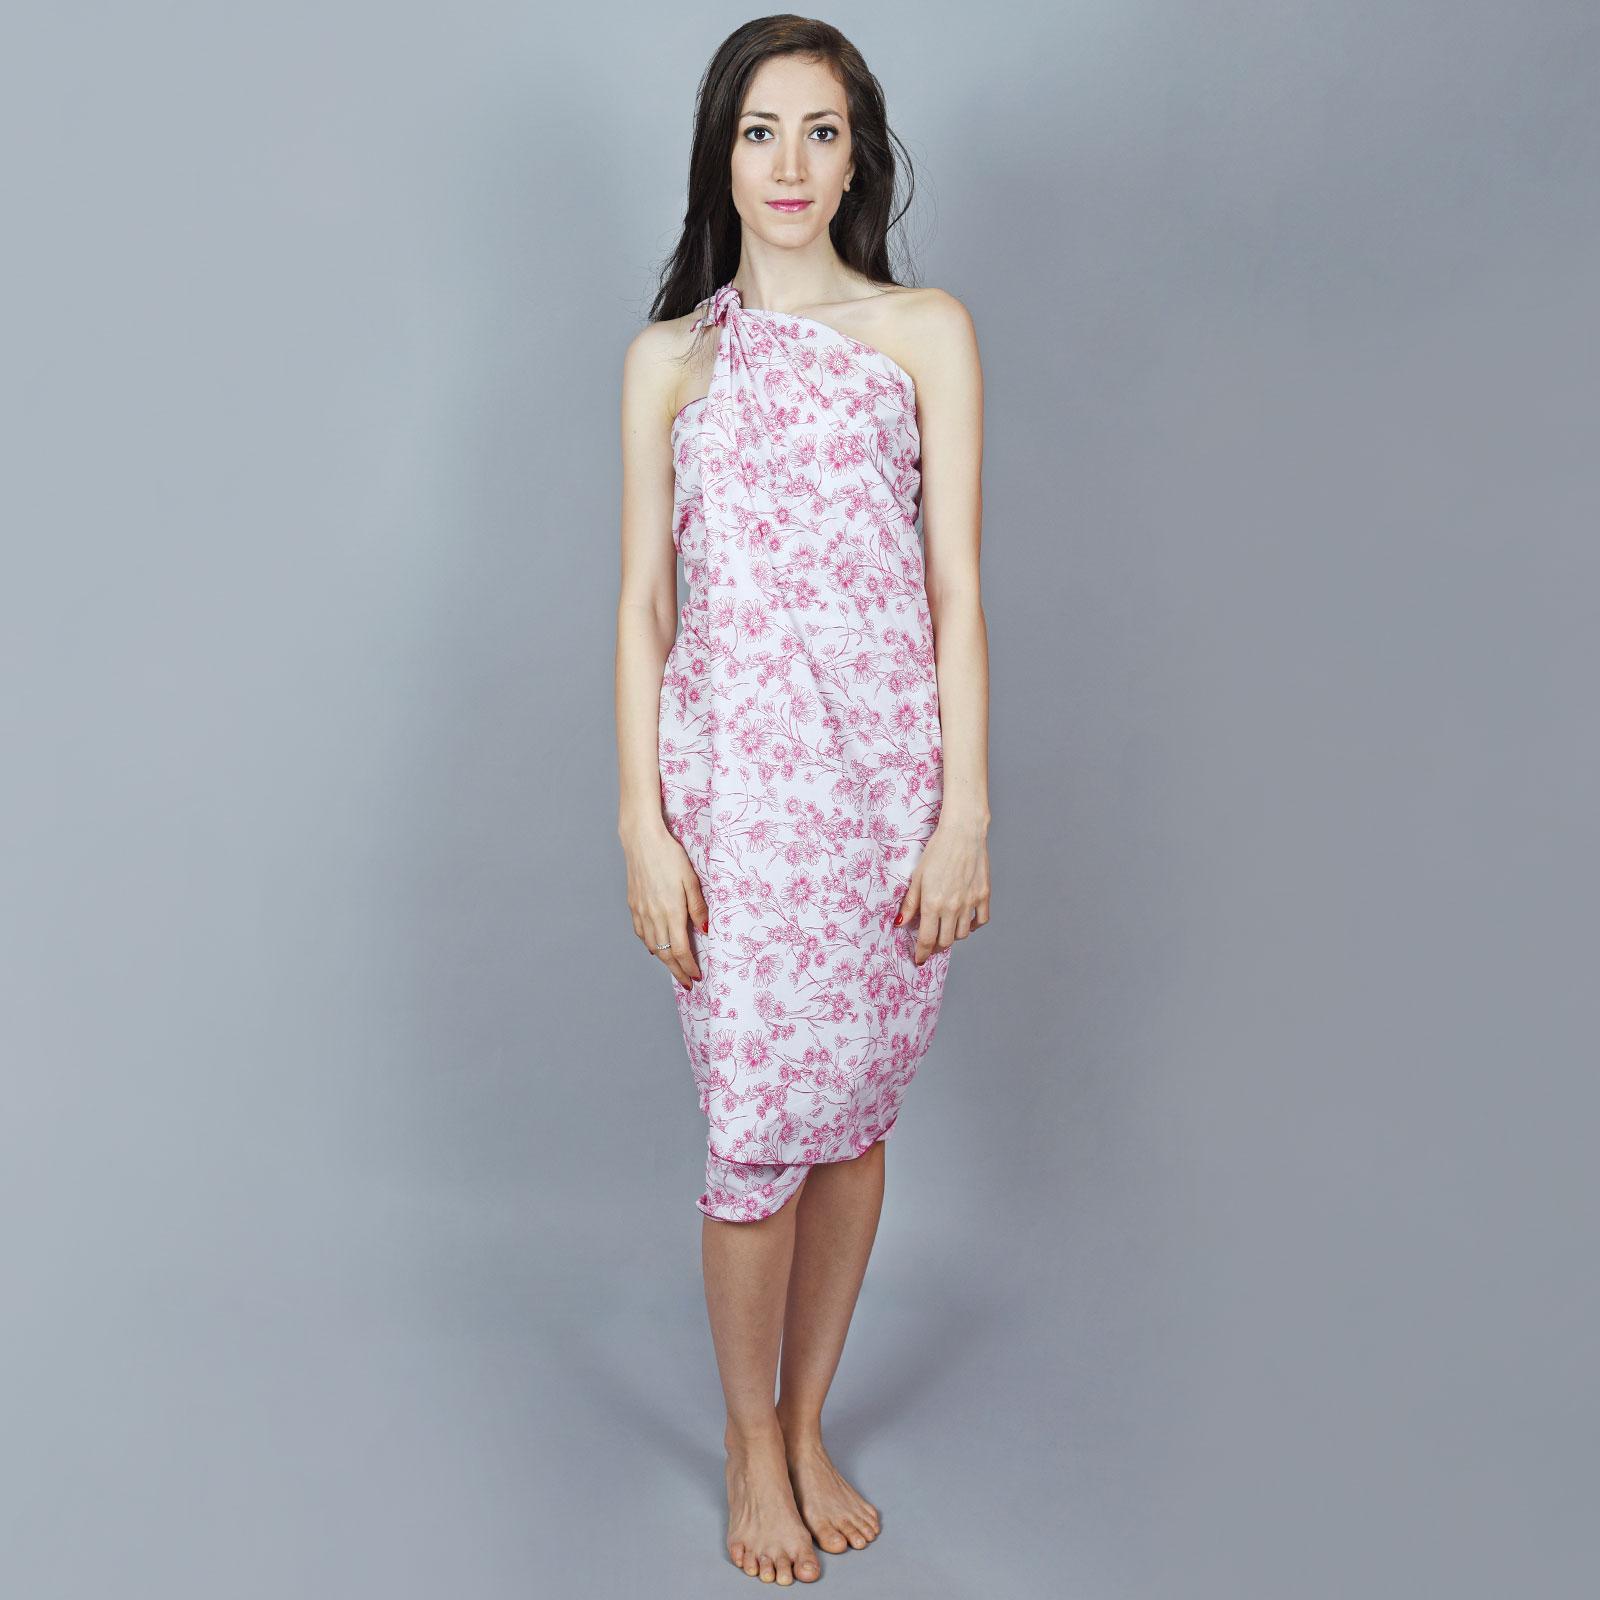 AT-04473-VF16-2-pareo-femme-rose-fuchsia